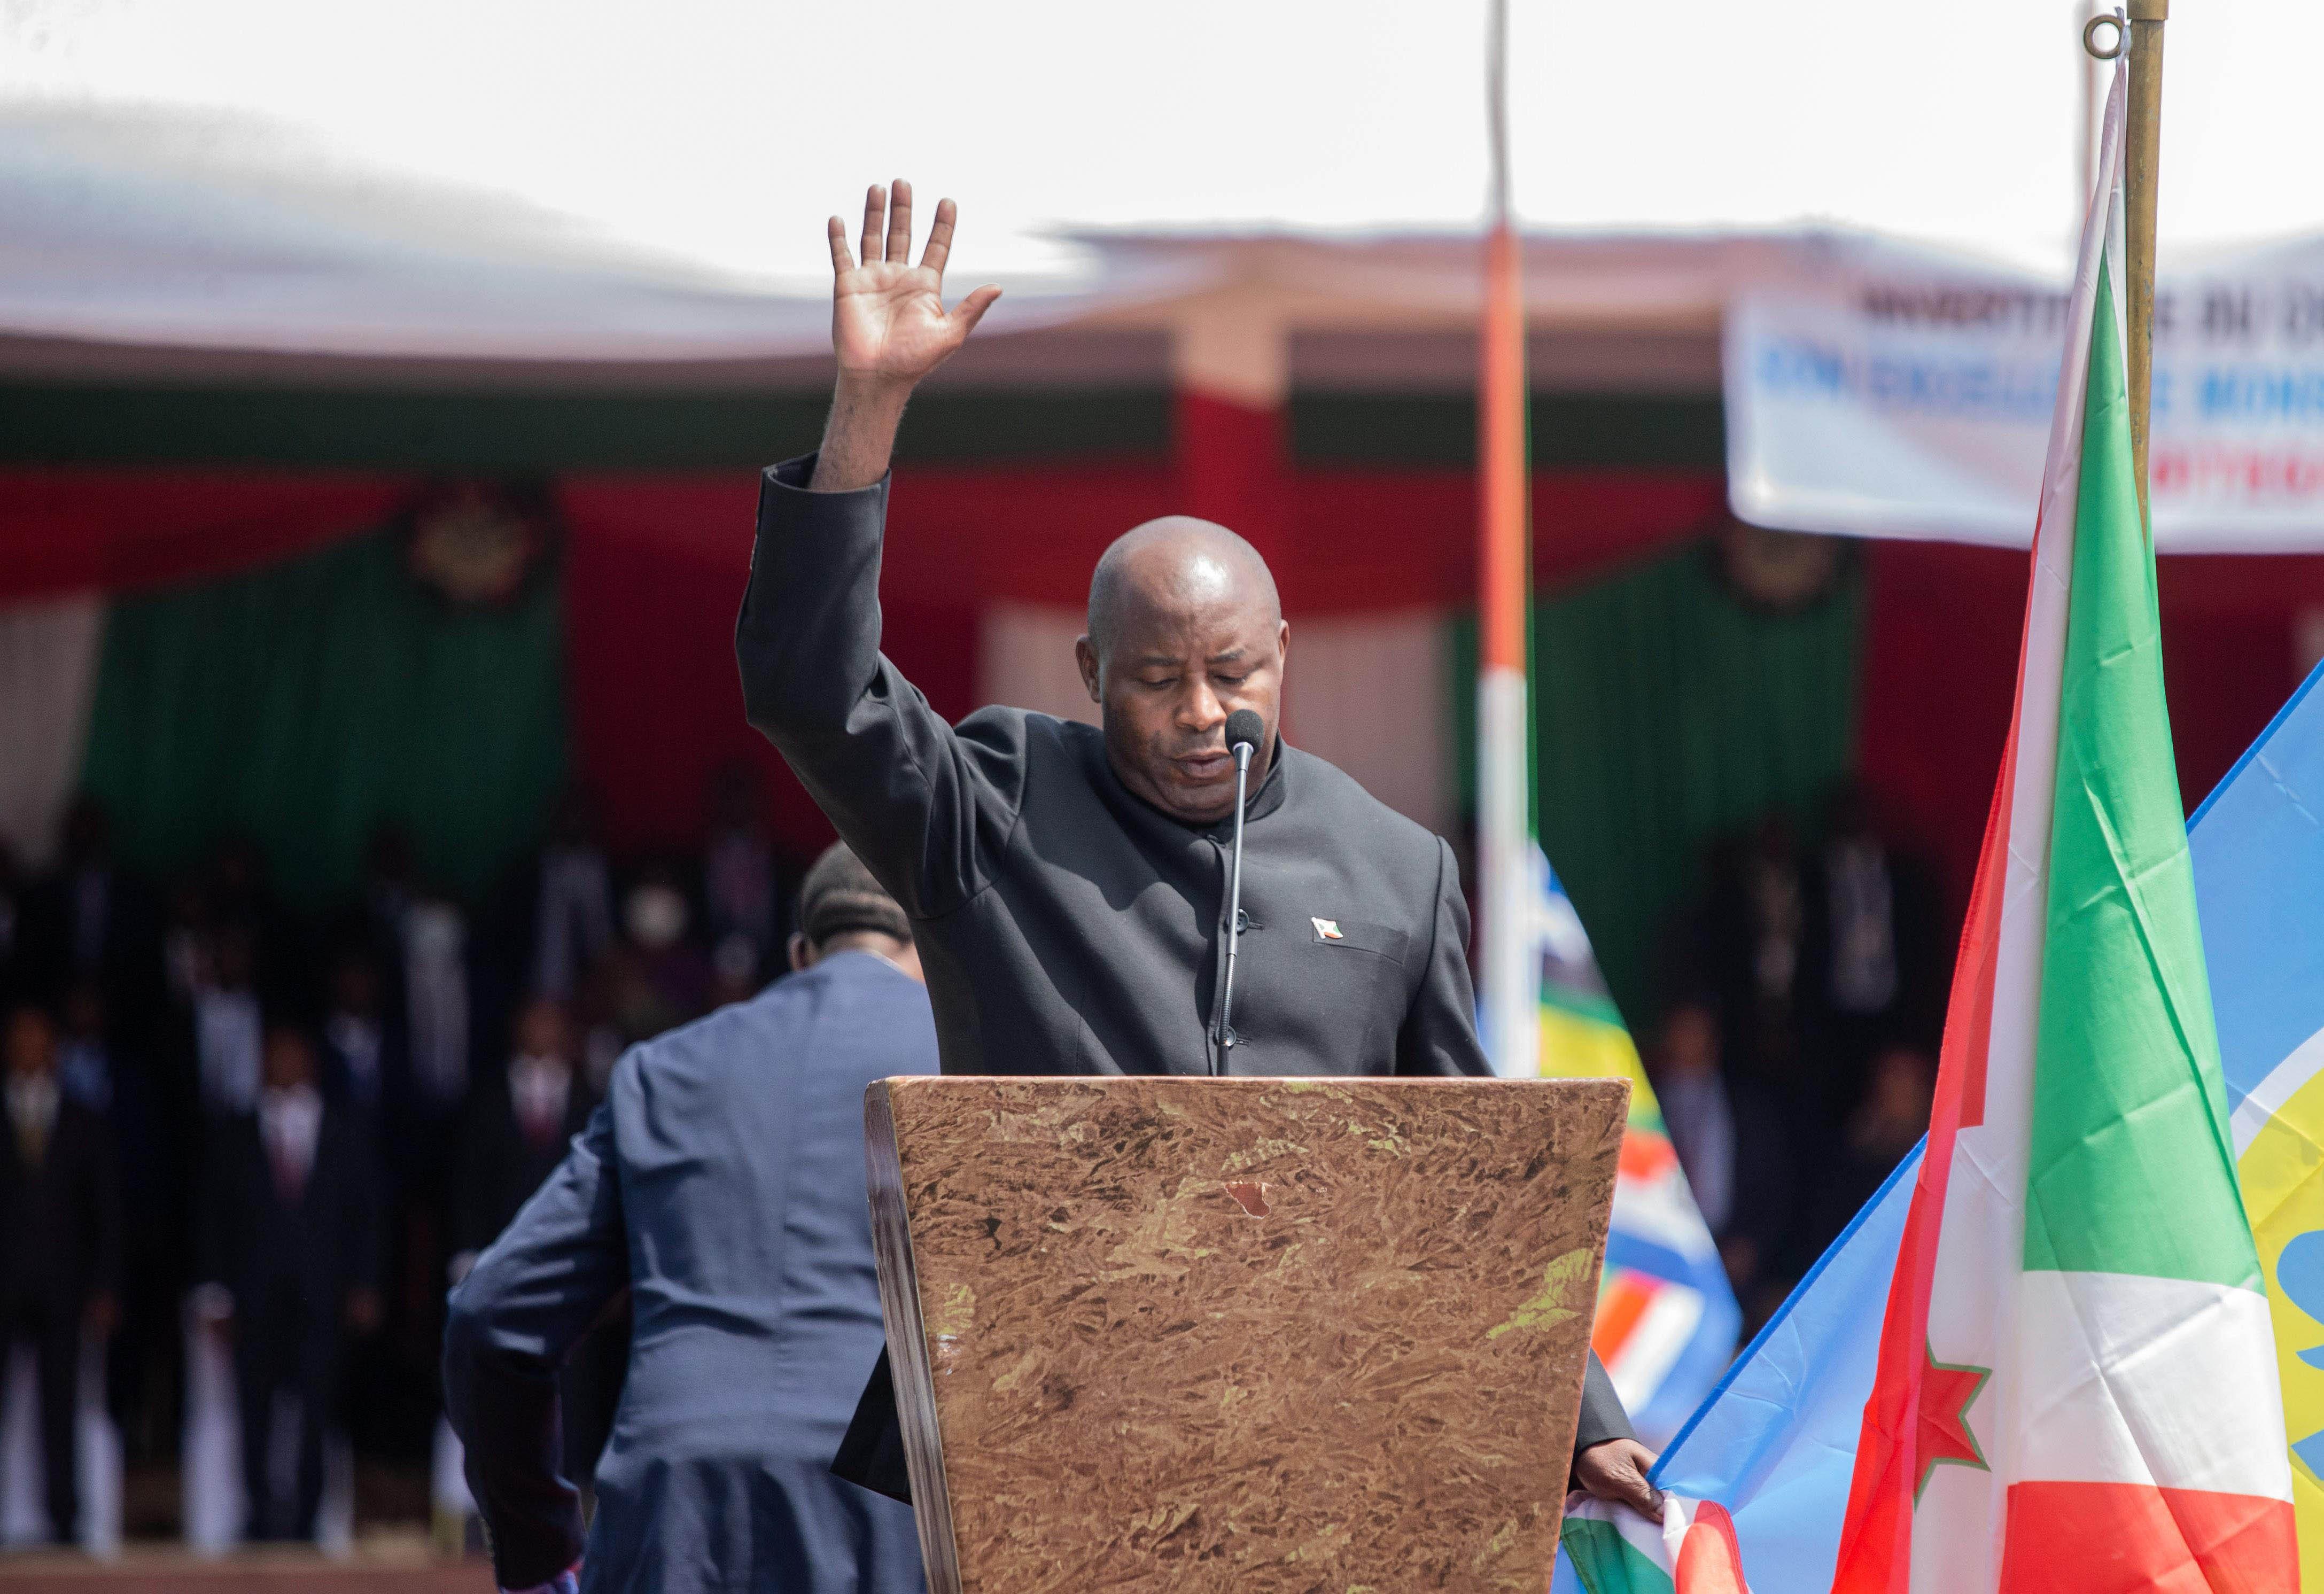 Burundi: Allegations of Killings, Disappearances, Torture